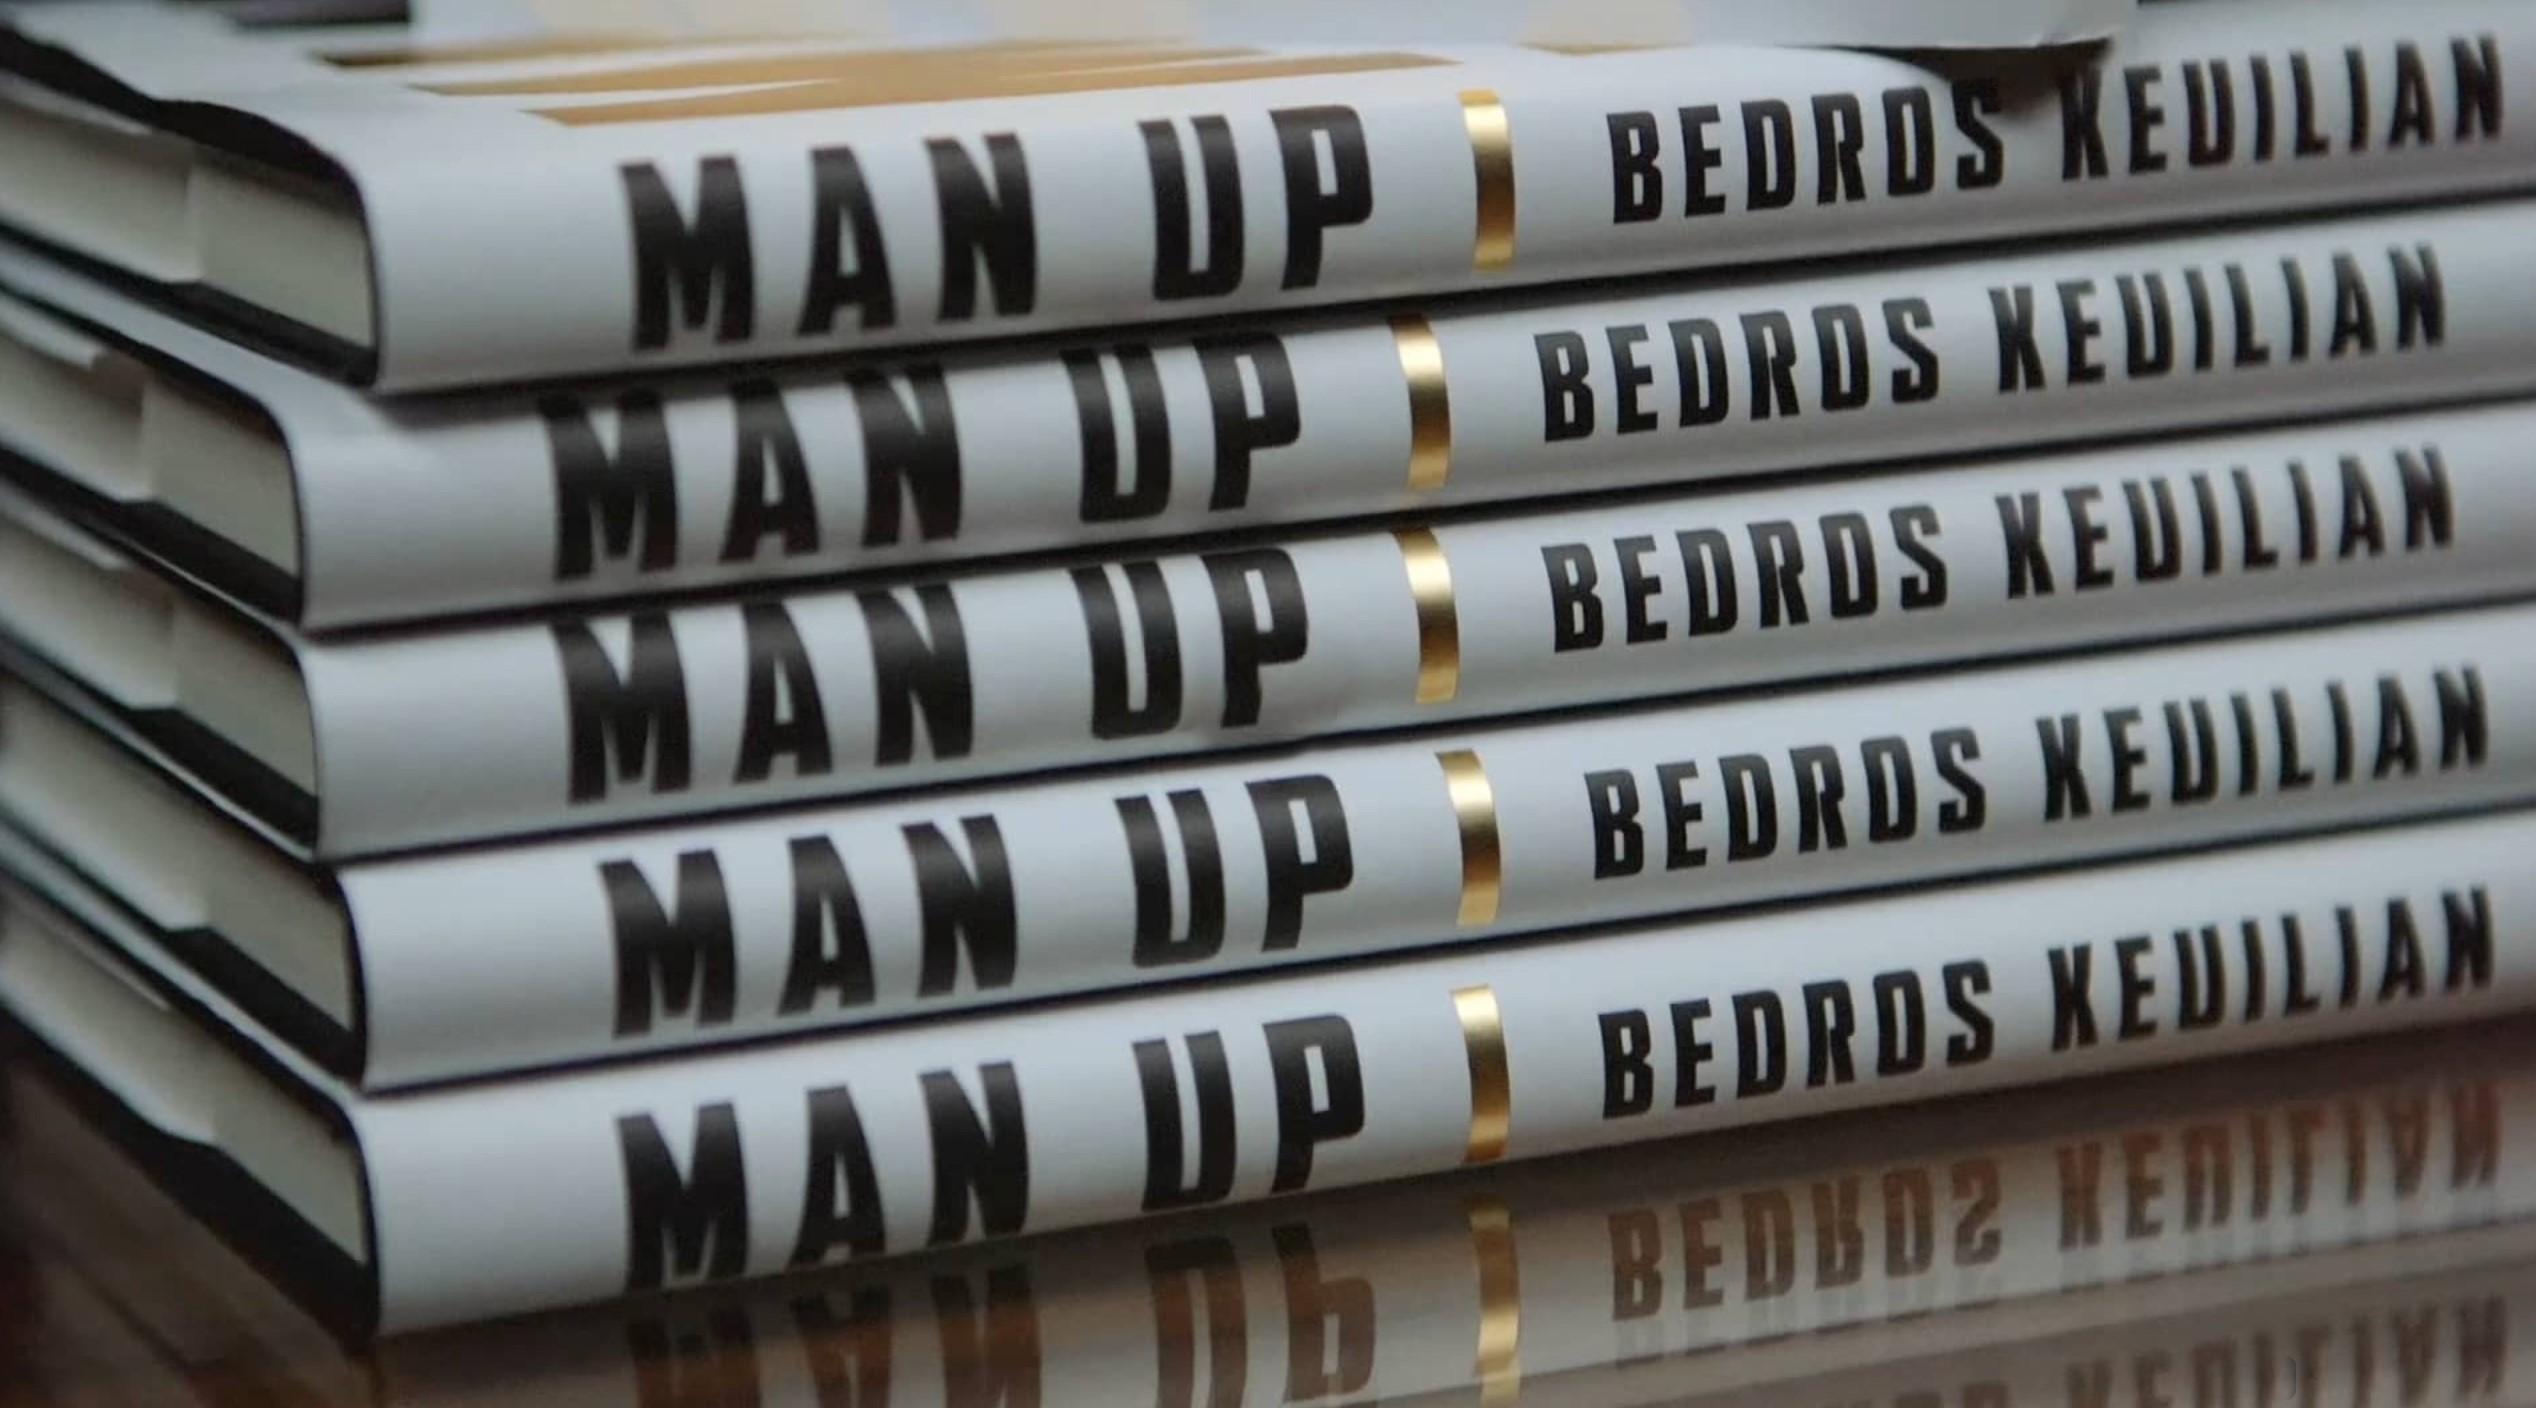 man up bedroom keuilian lifestyle magazine